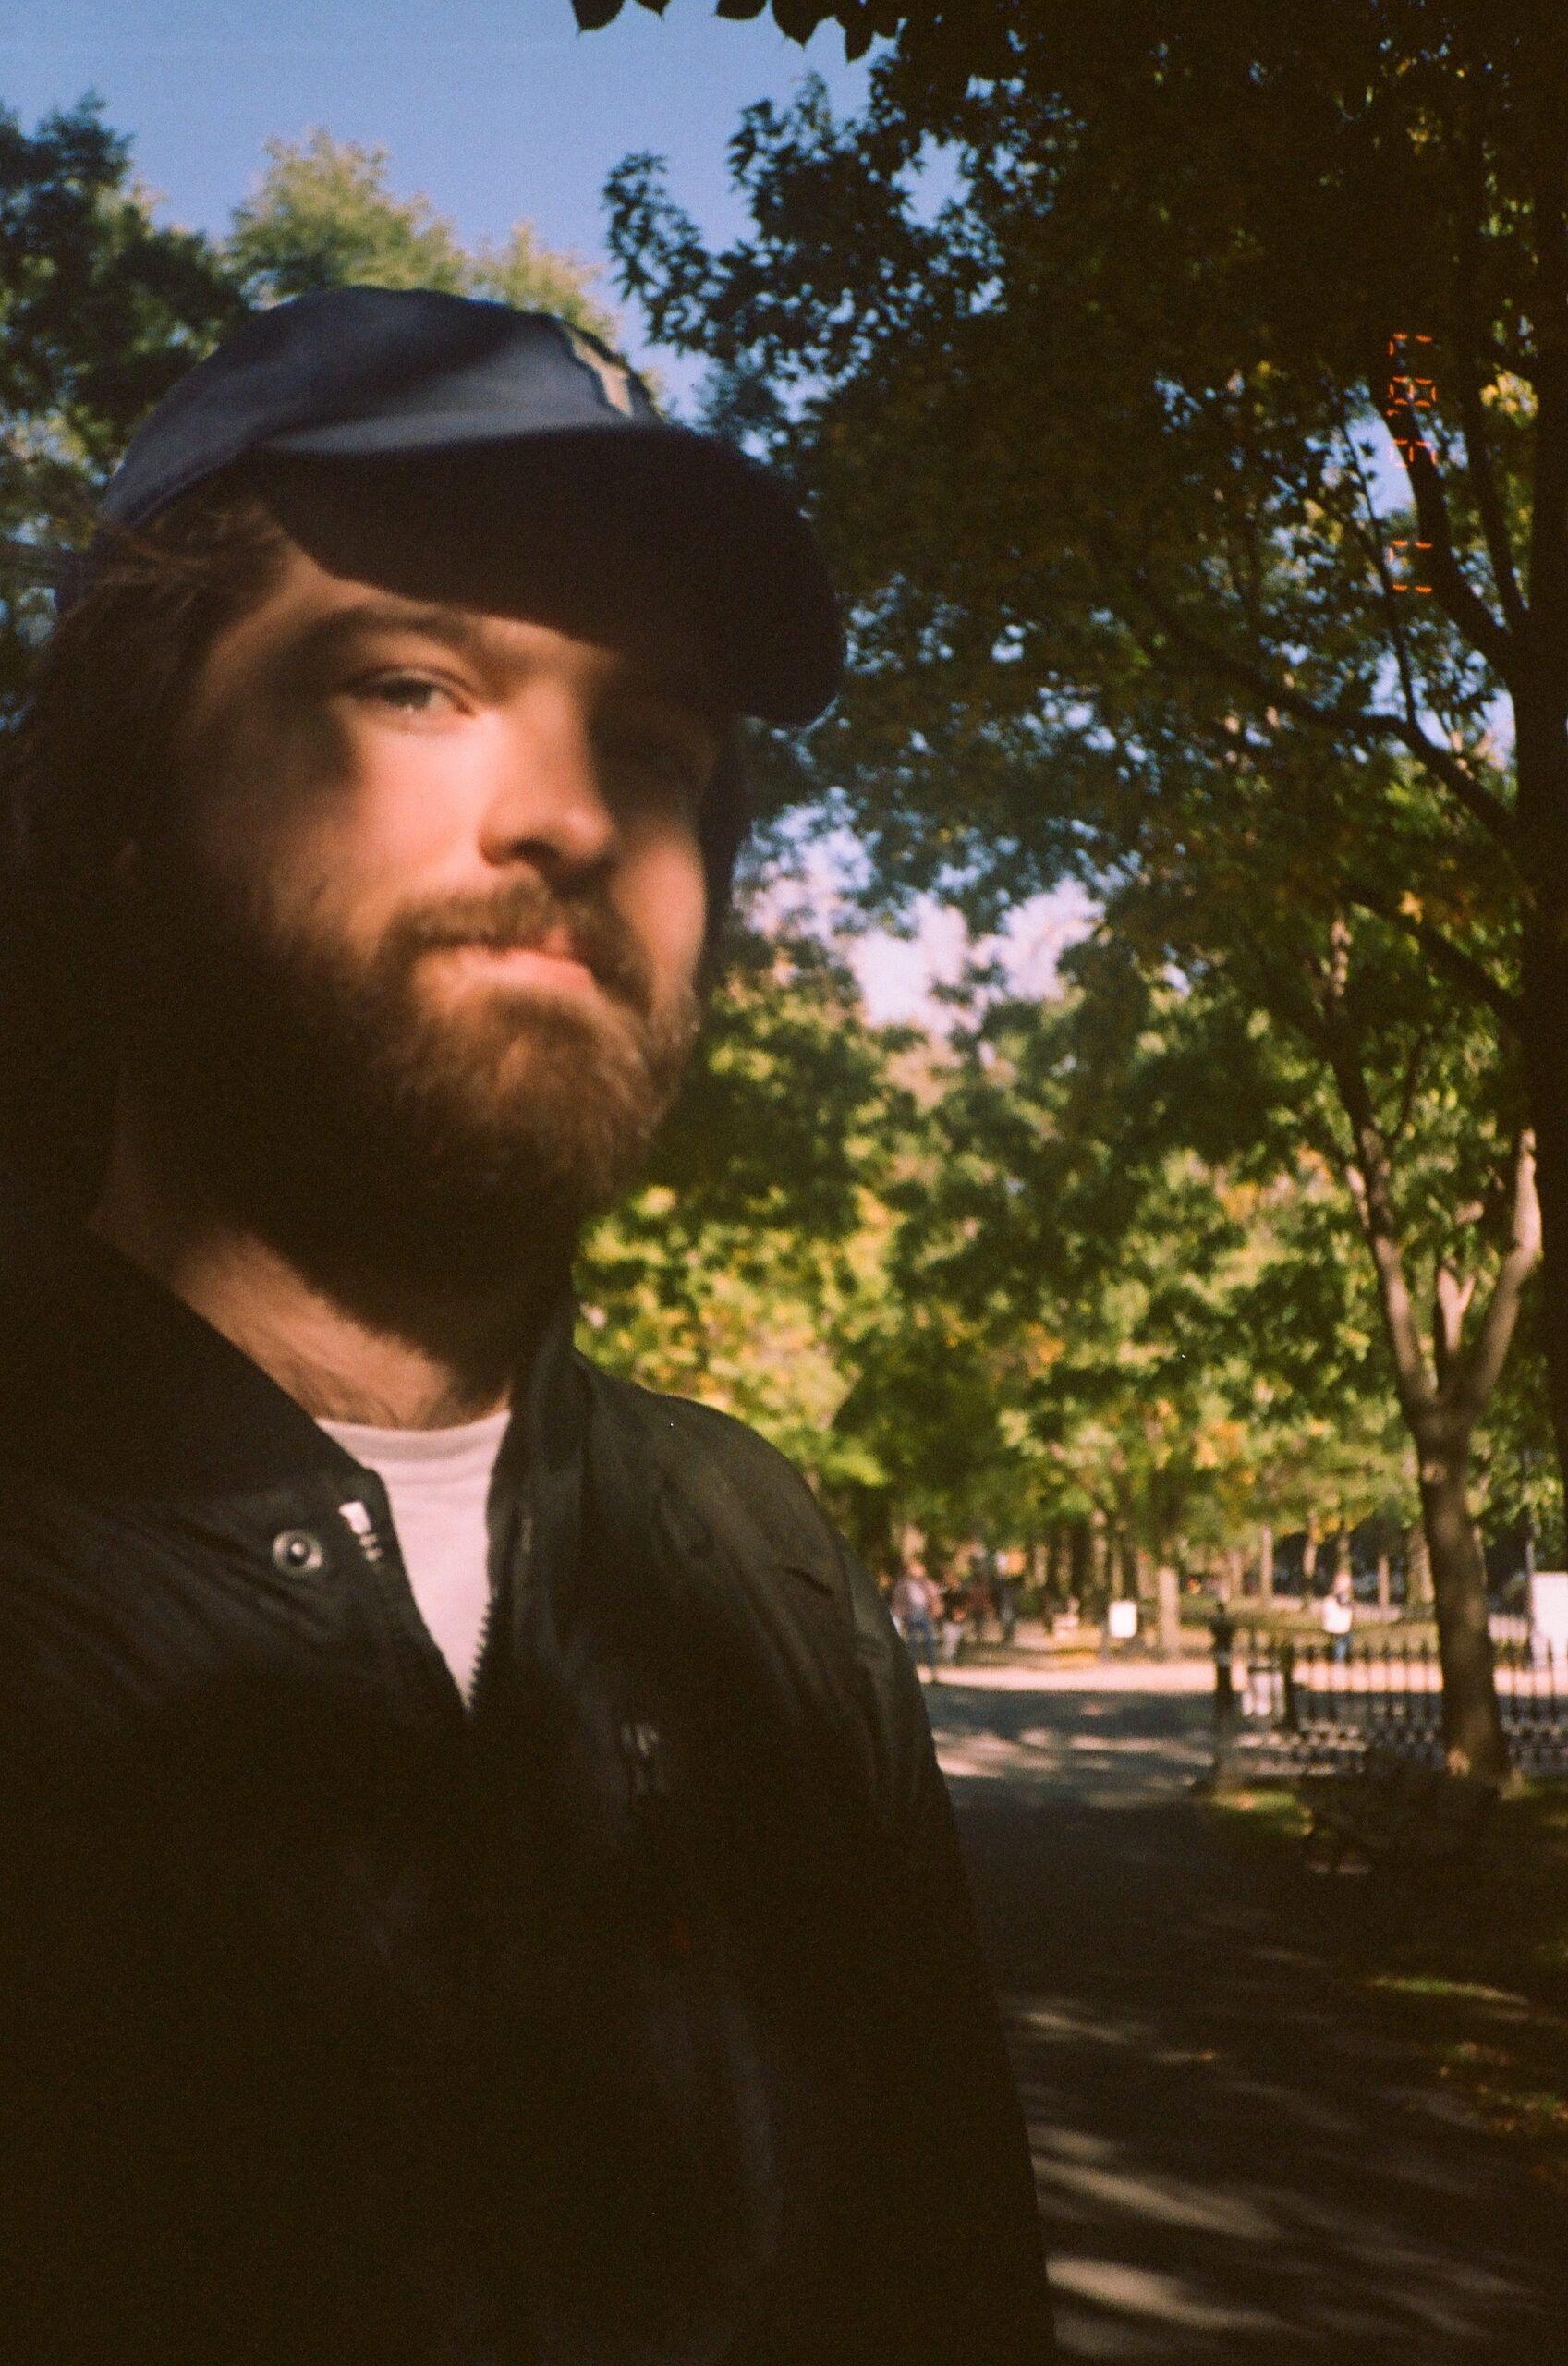 Dylan Foley